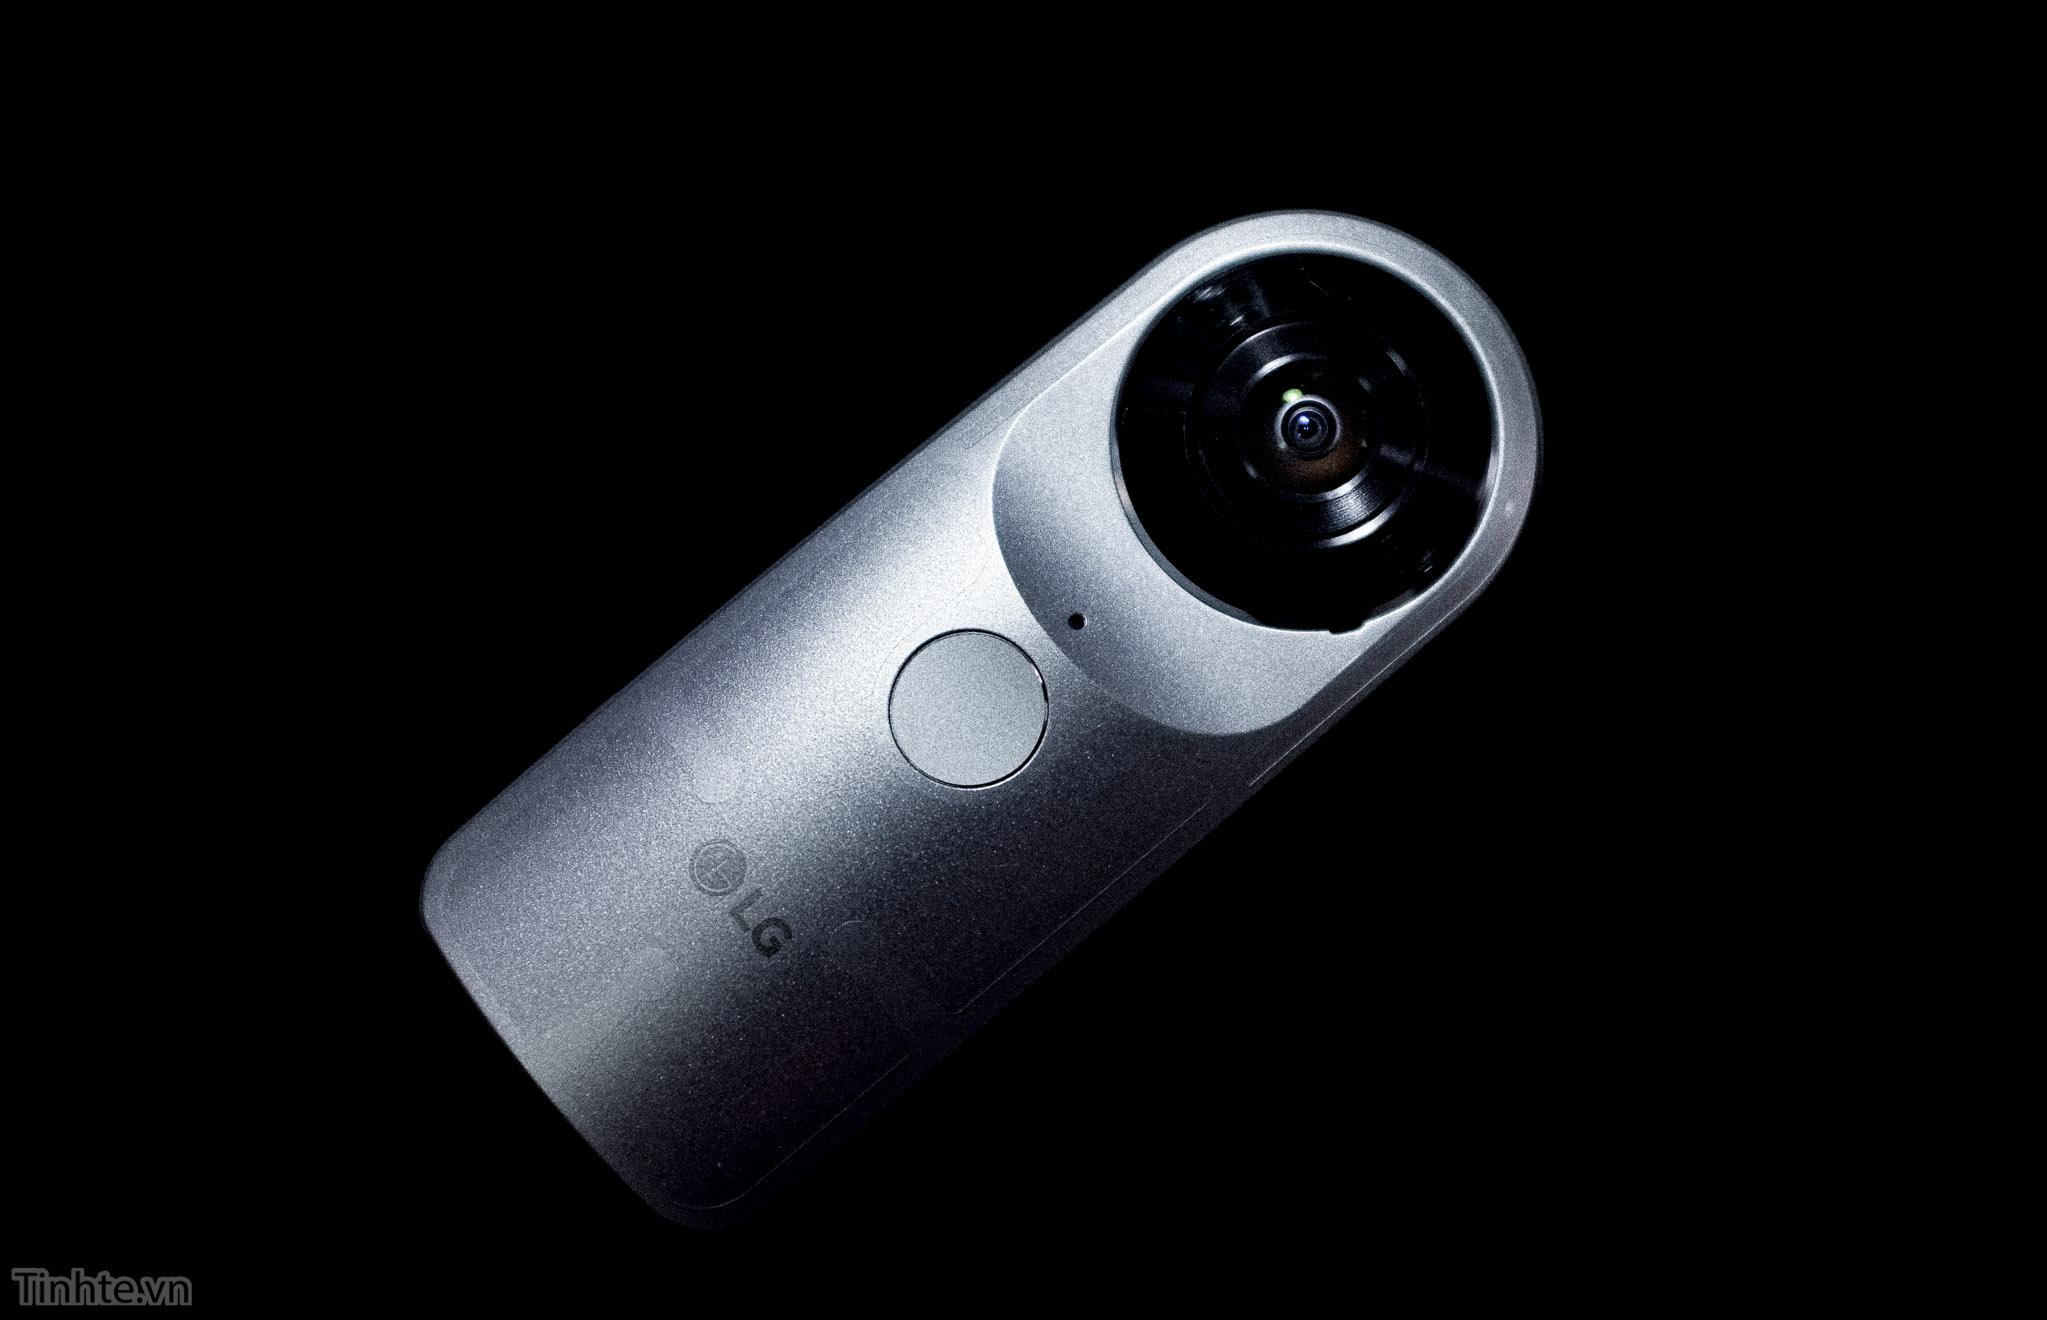 Lg-360cam-tinhte-2.jpg